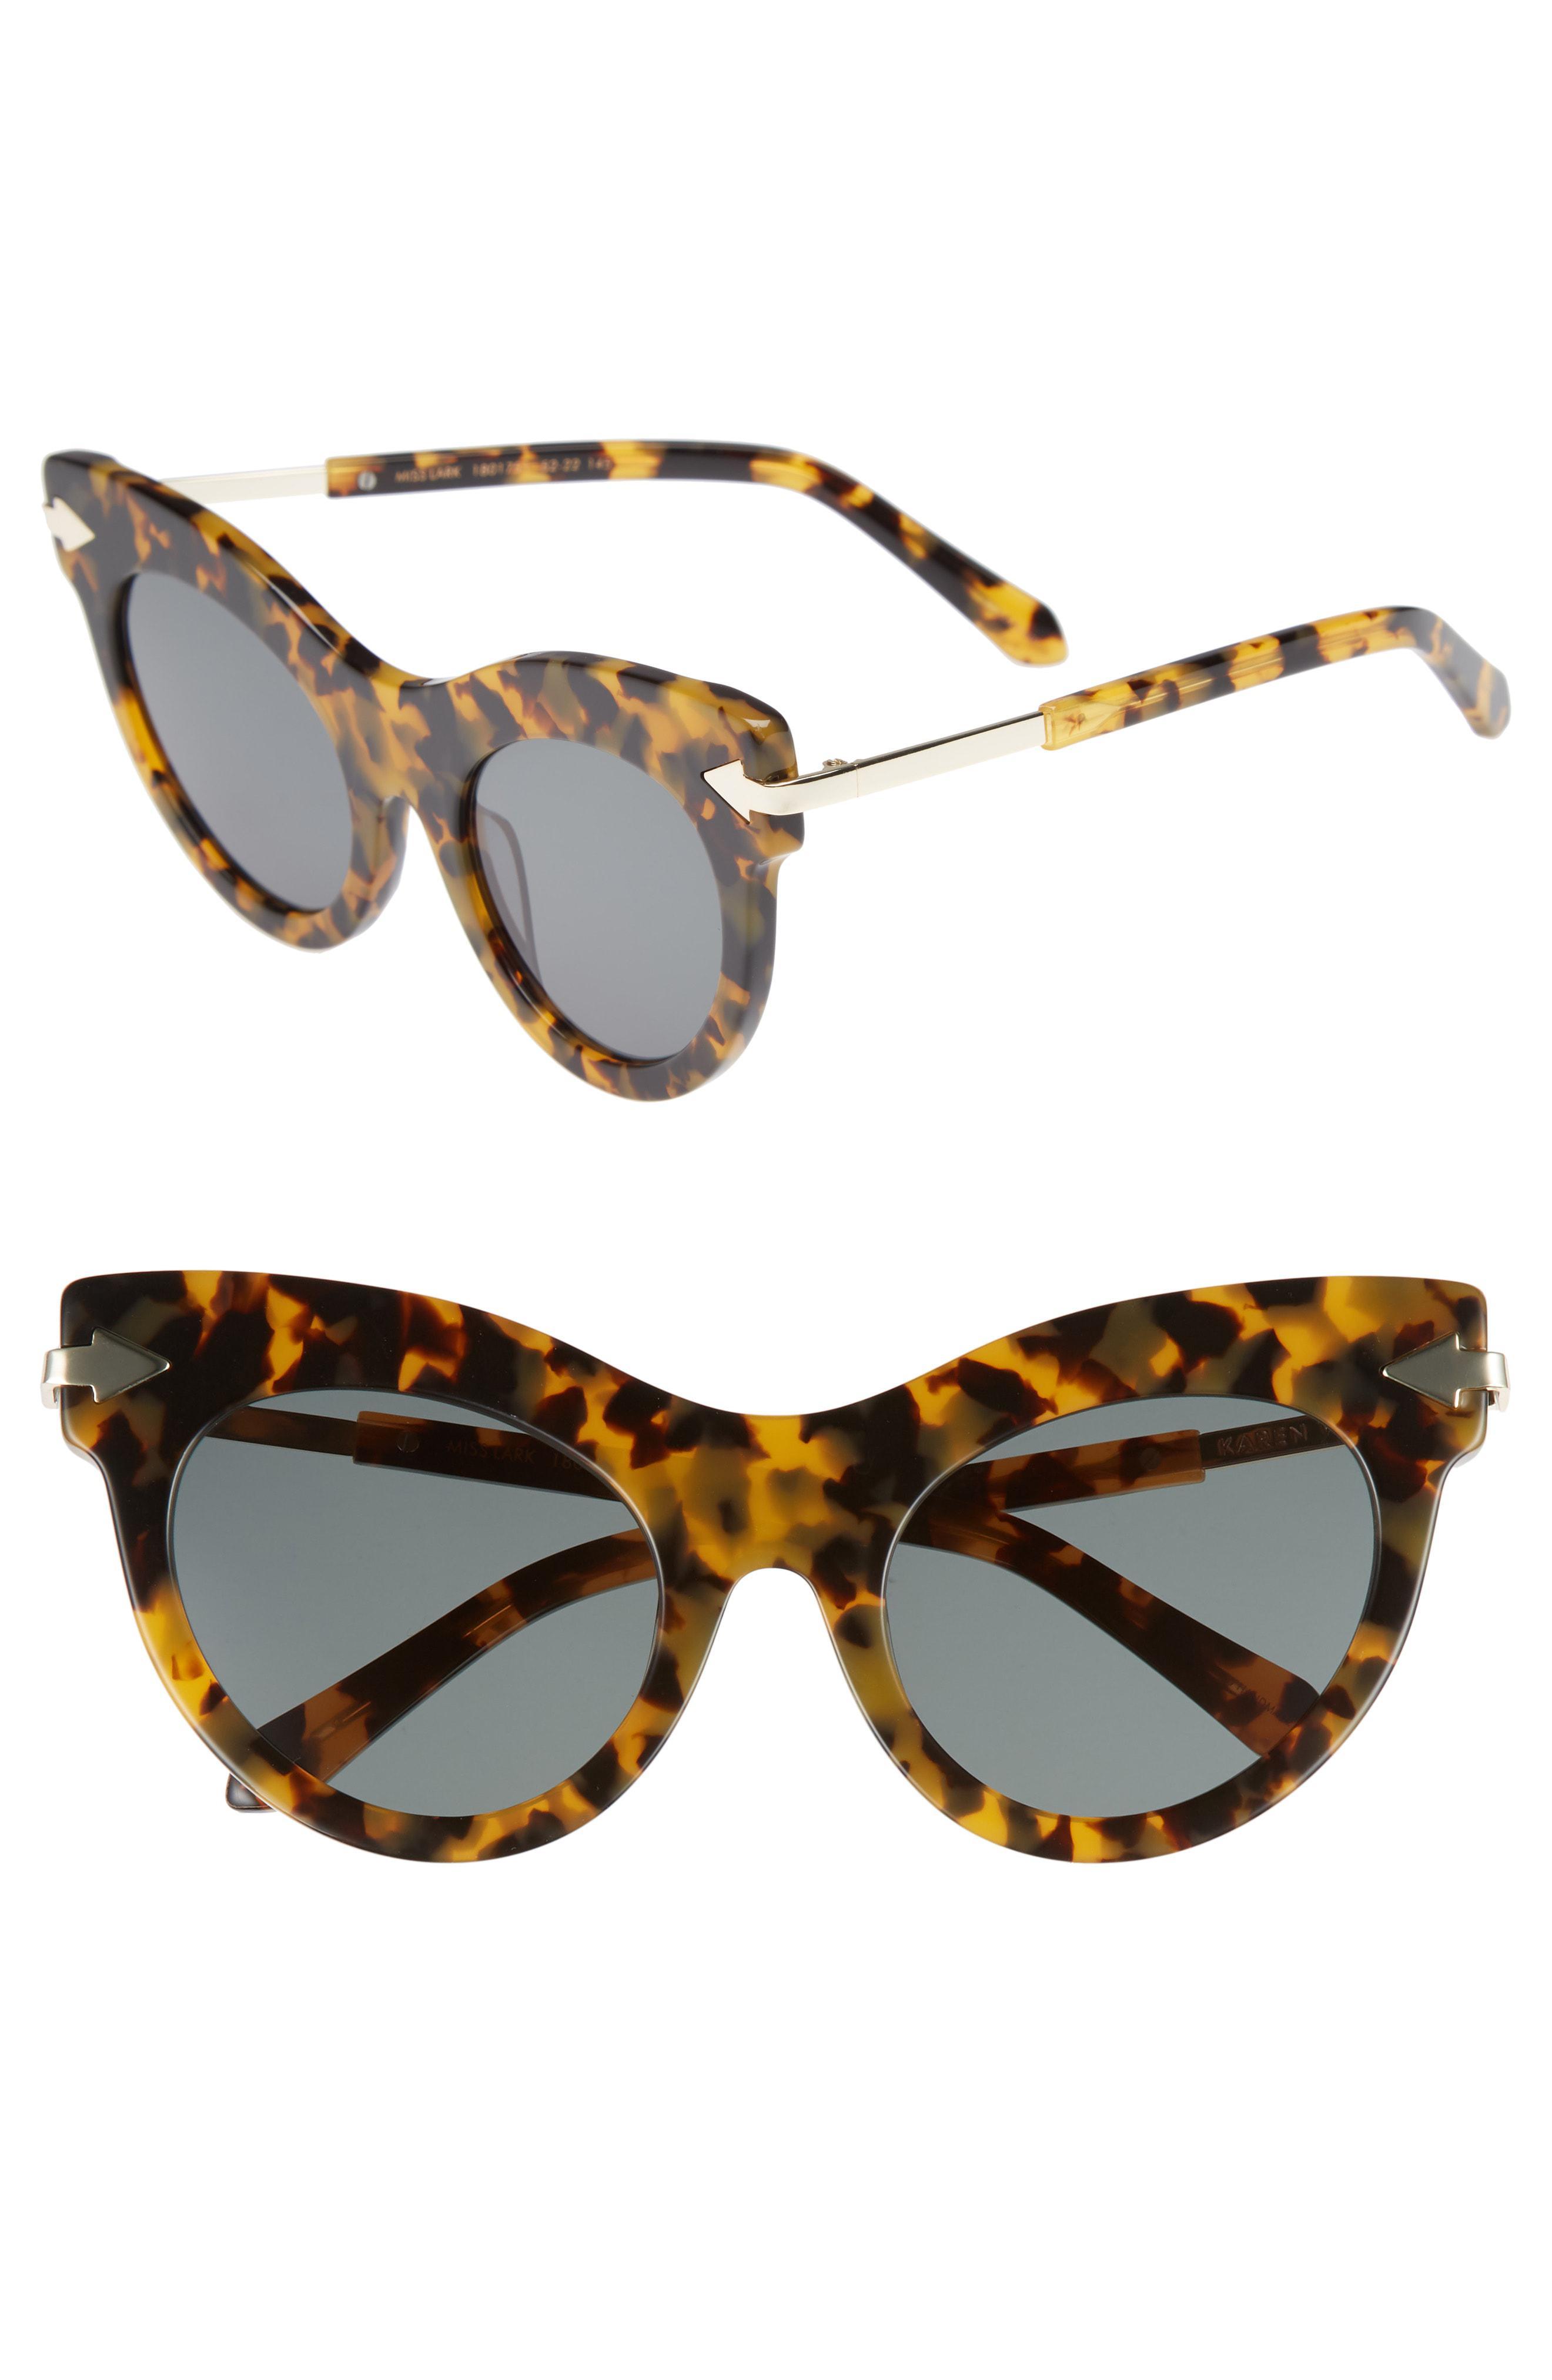 ace44d4541e9 Lyst - Karen Walker Miss Lark 52mm Cat Eye Sunglasses - Crazy ...